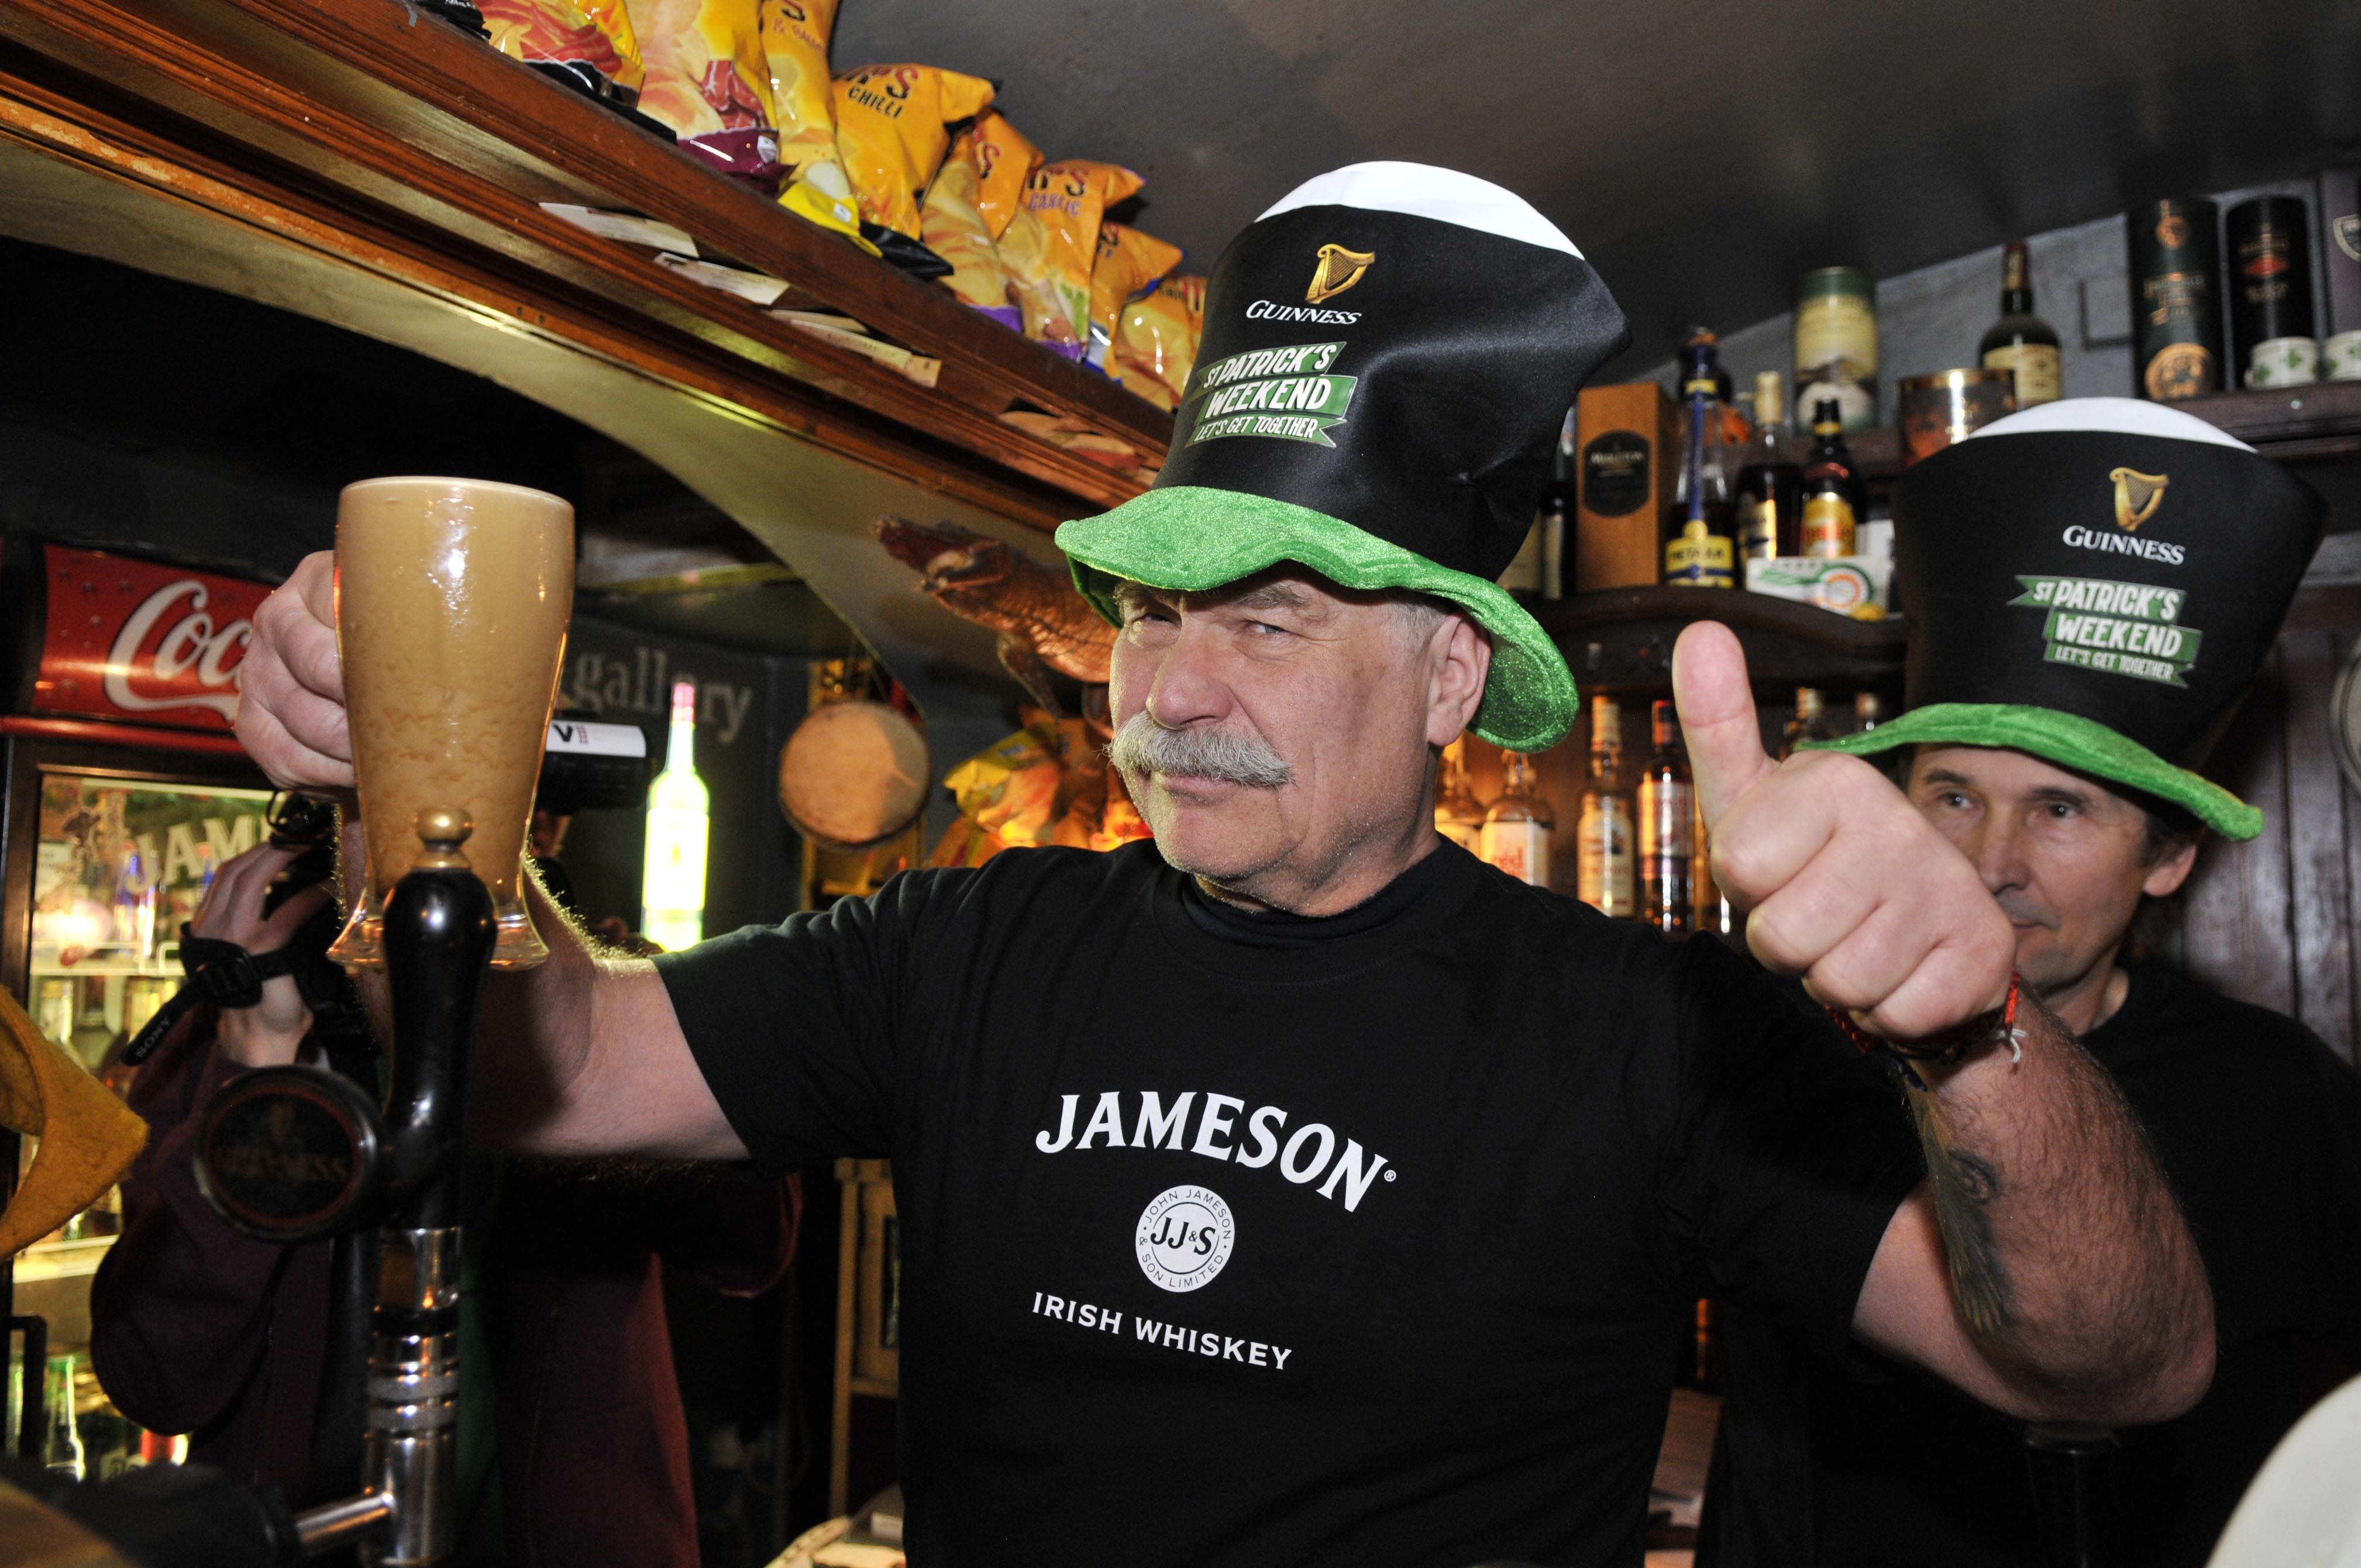 Zapijte Patrika Guinnessem